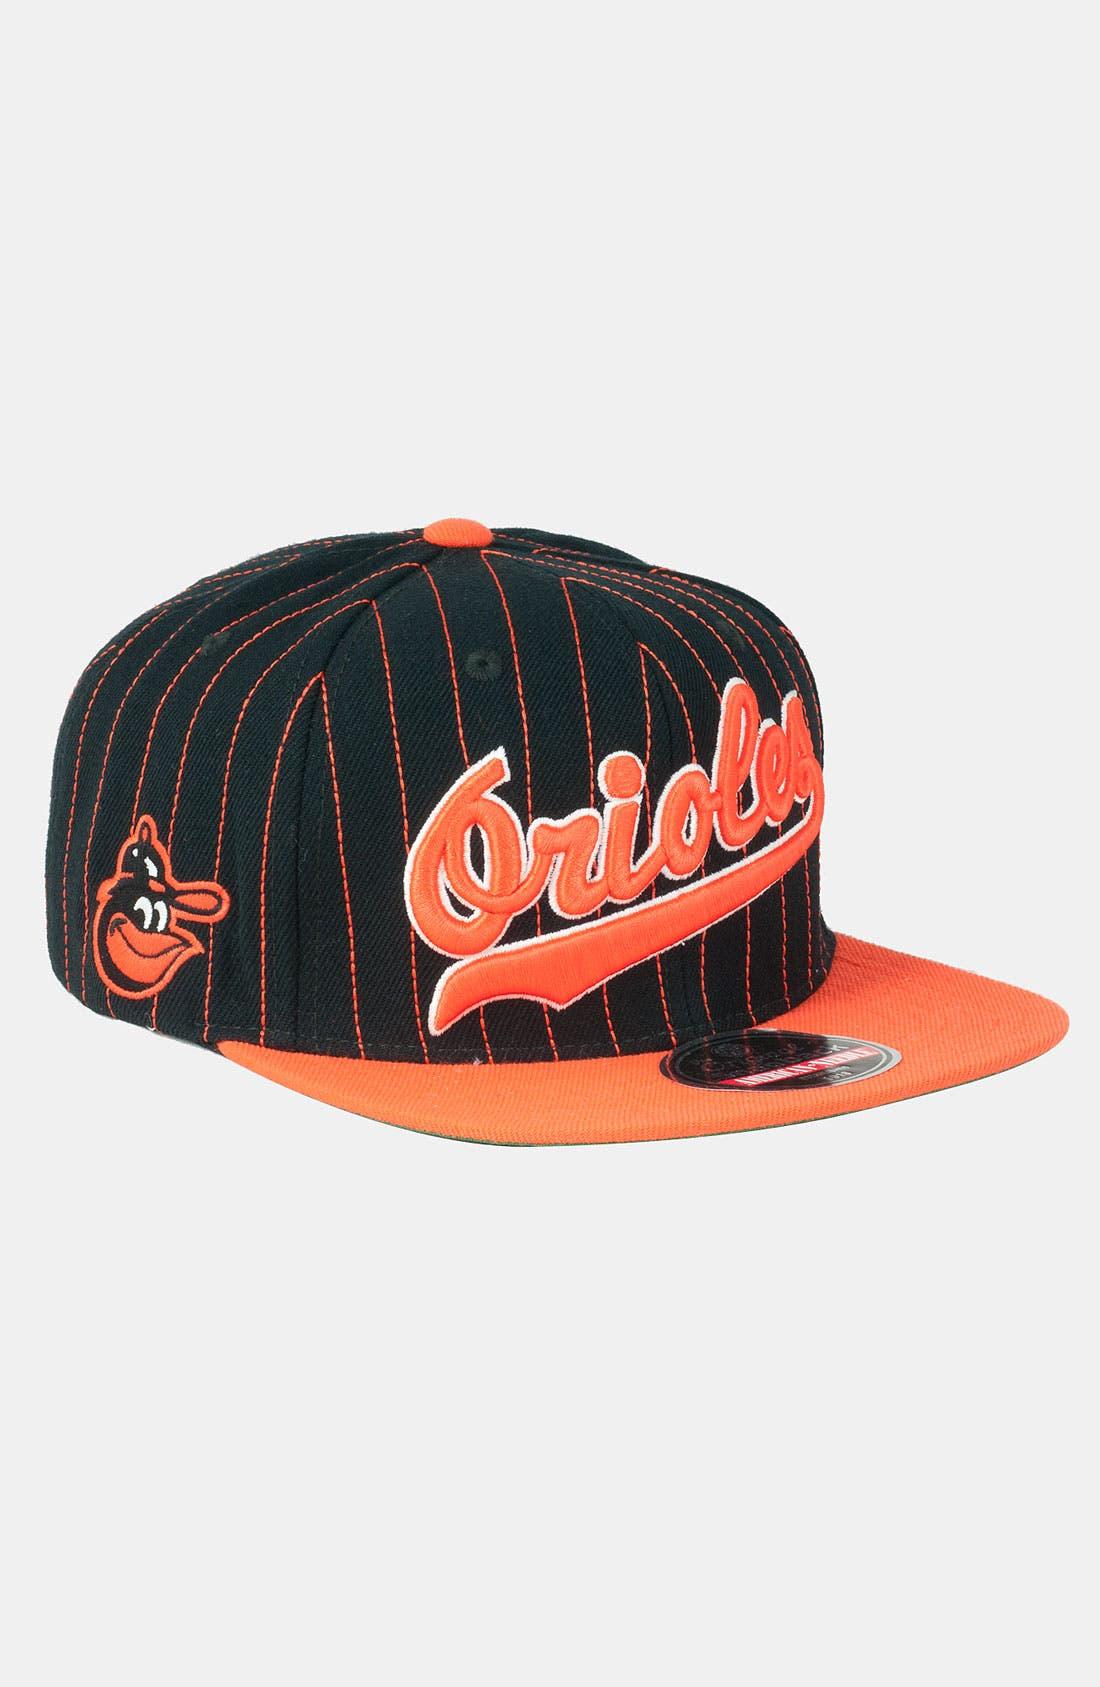 Alternate Image 1 Selected - American Needle 'Orioles' Snapback Baseball Cap